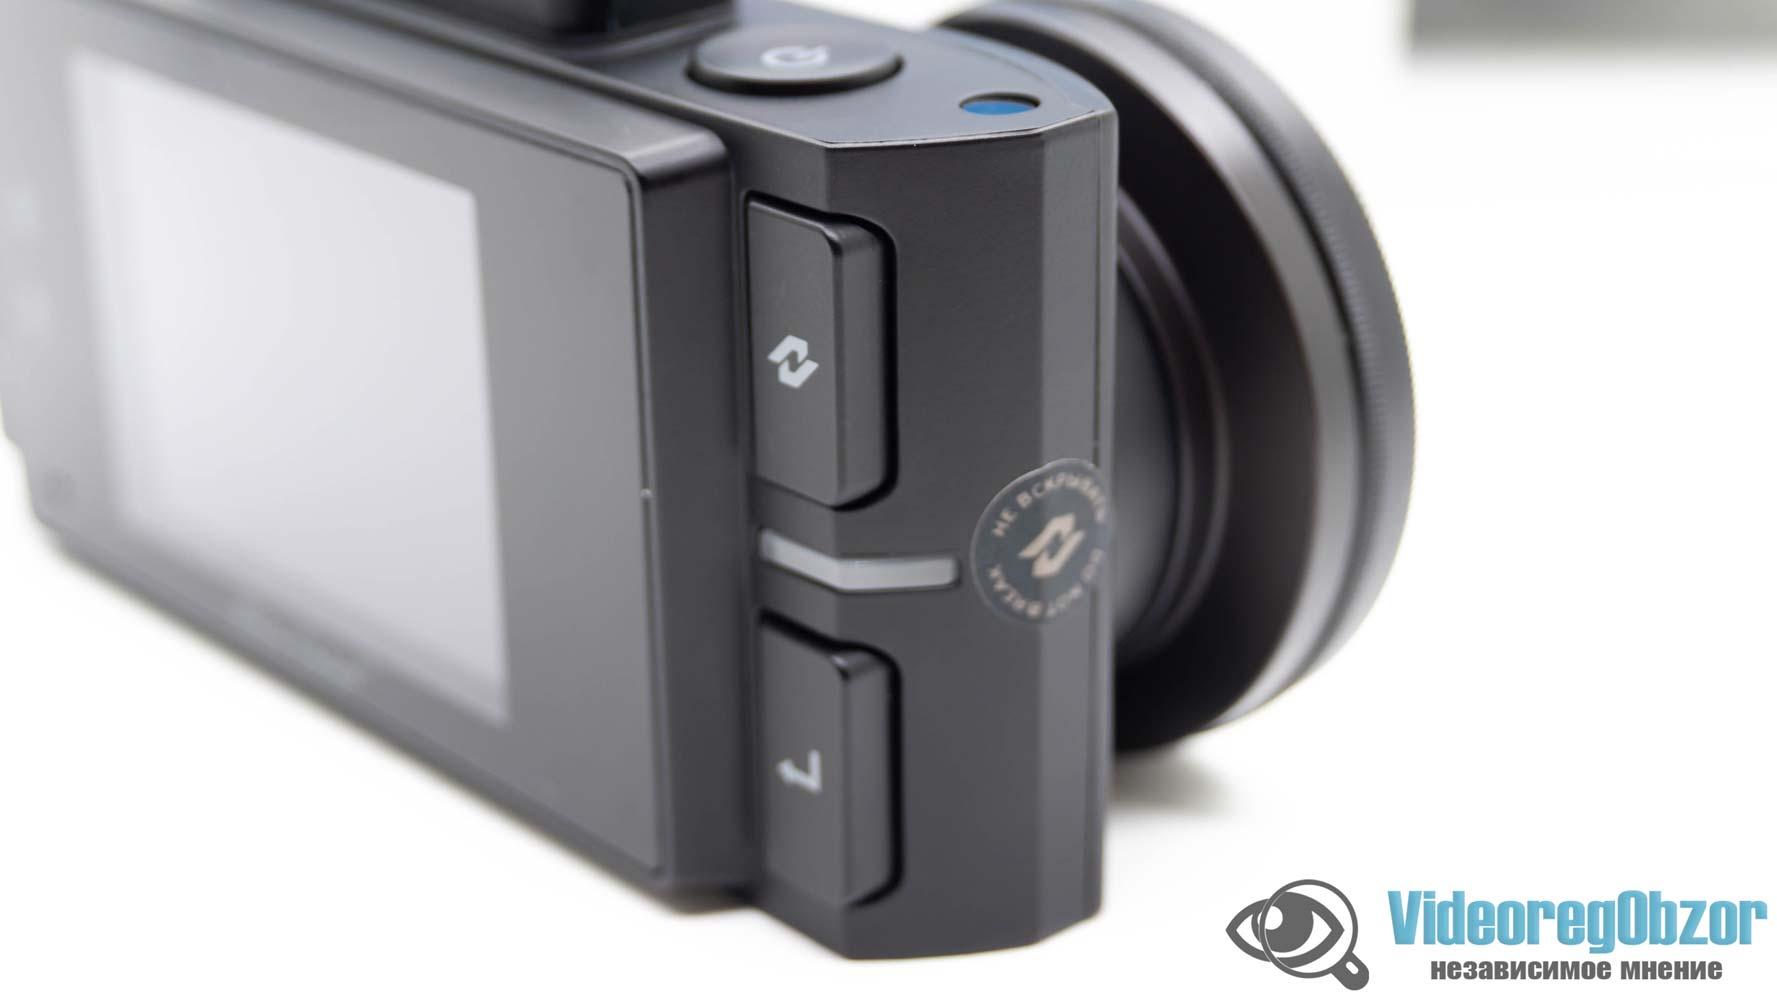 Neoline X COP 9200 обзор 26 VideoregObzor Neoline X-COP 9200: обзор видеорегистратора с радар-детектором